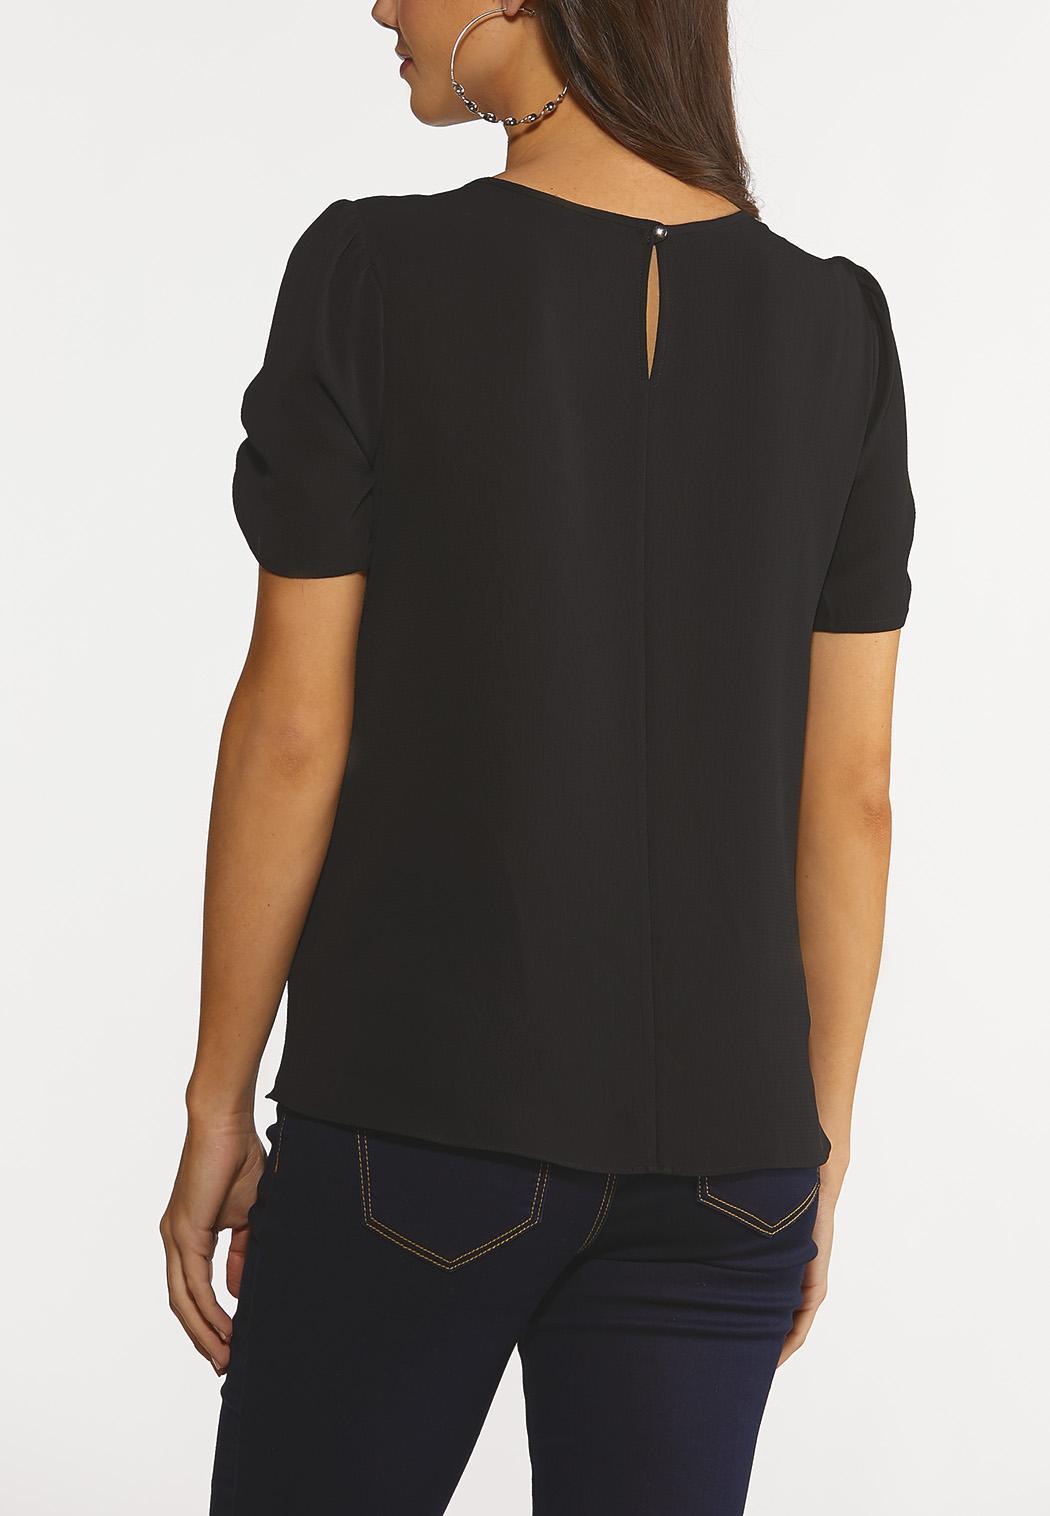 Black Ruched Sleeve Top (Item #44246735)